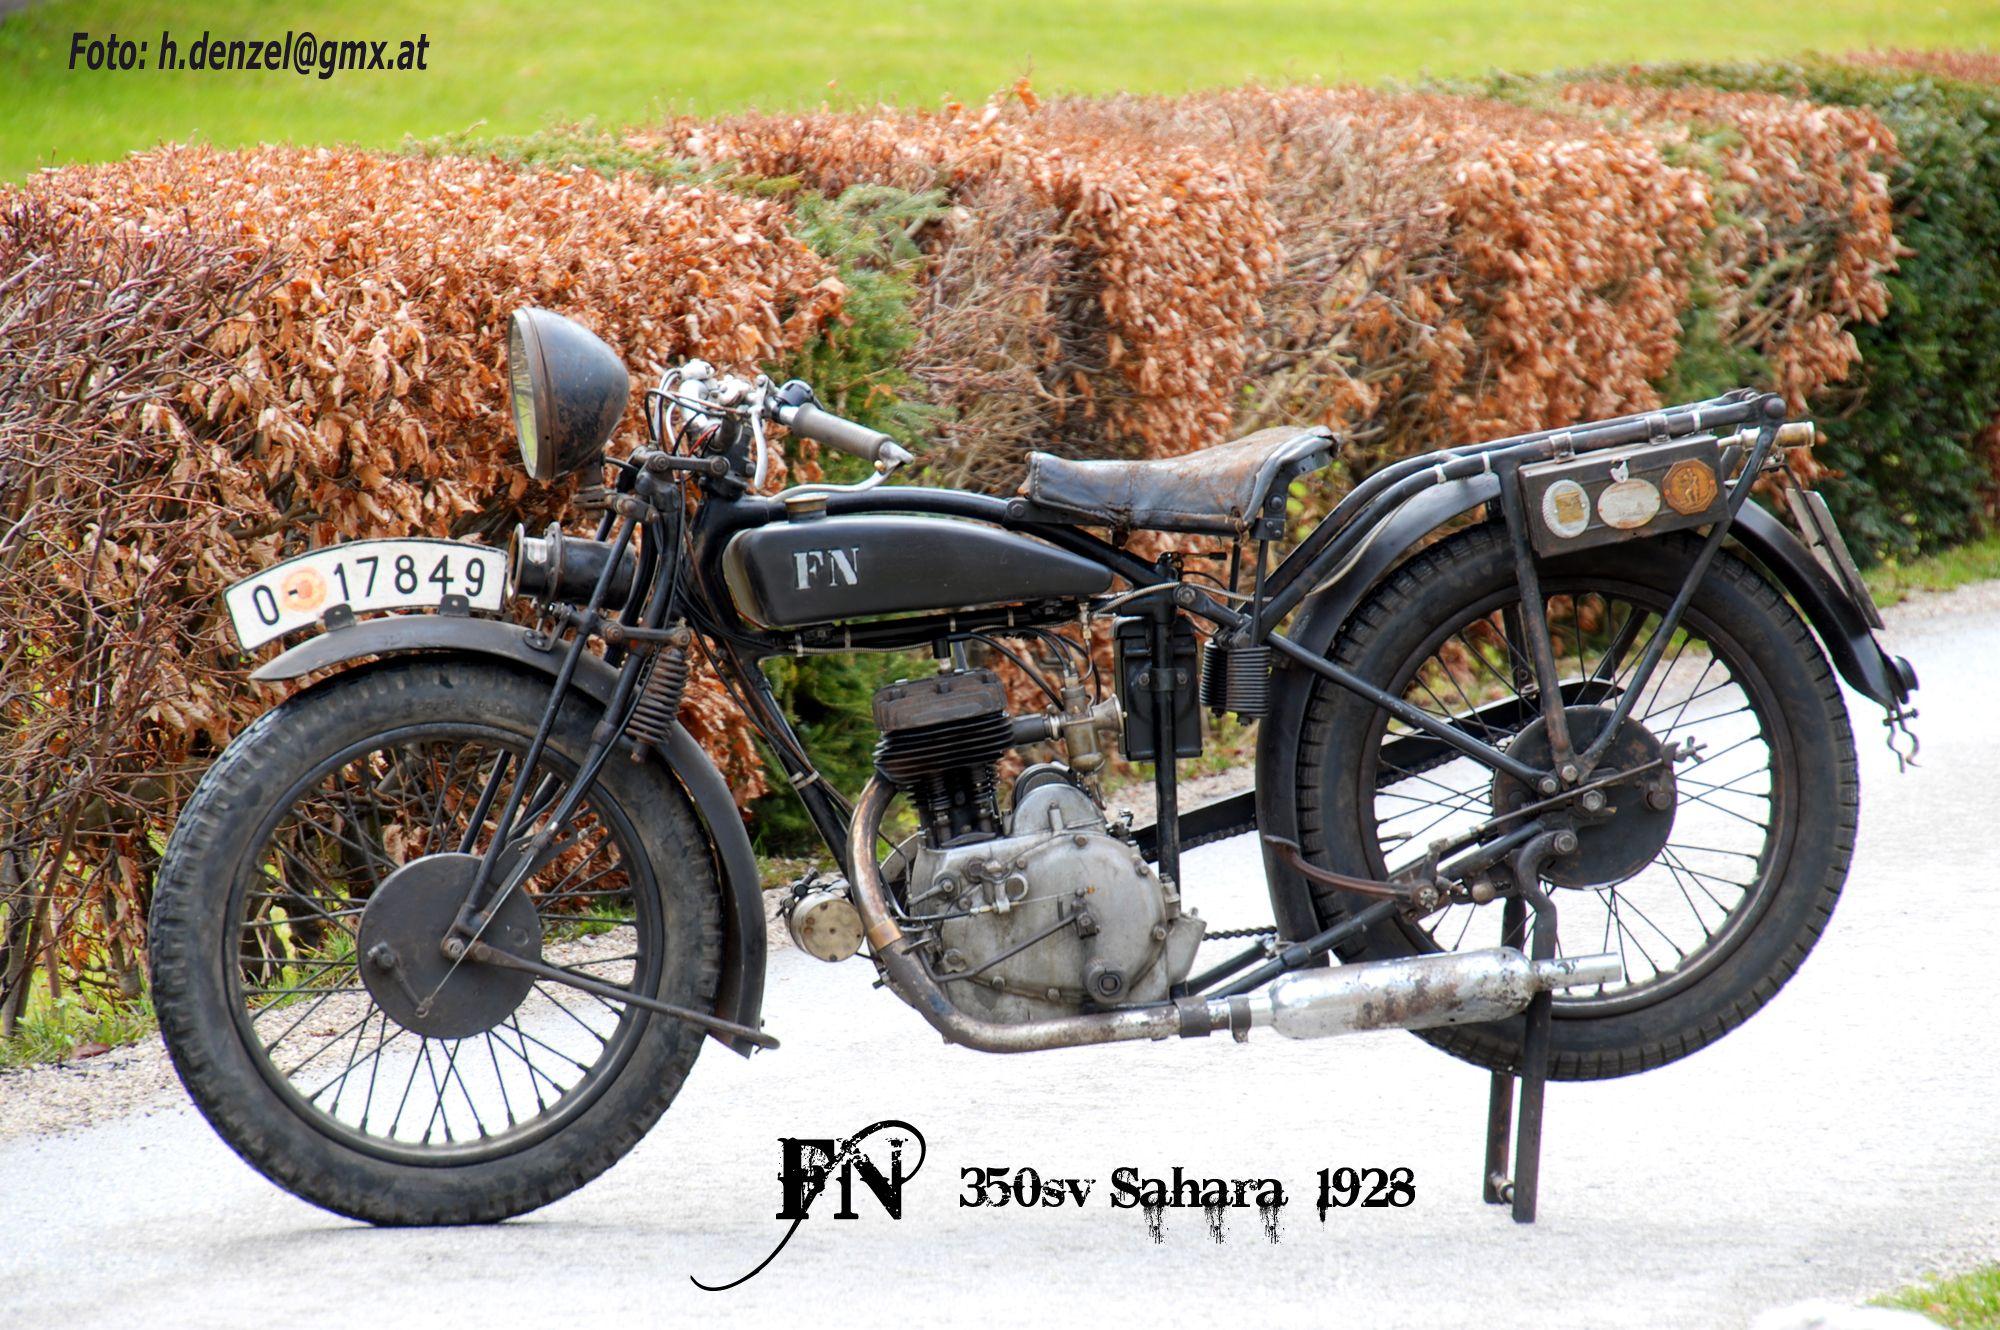 Harley Davidson 1928 28b 350cc 1 Cyl Sv: Diesel Punk Inspiration